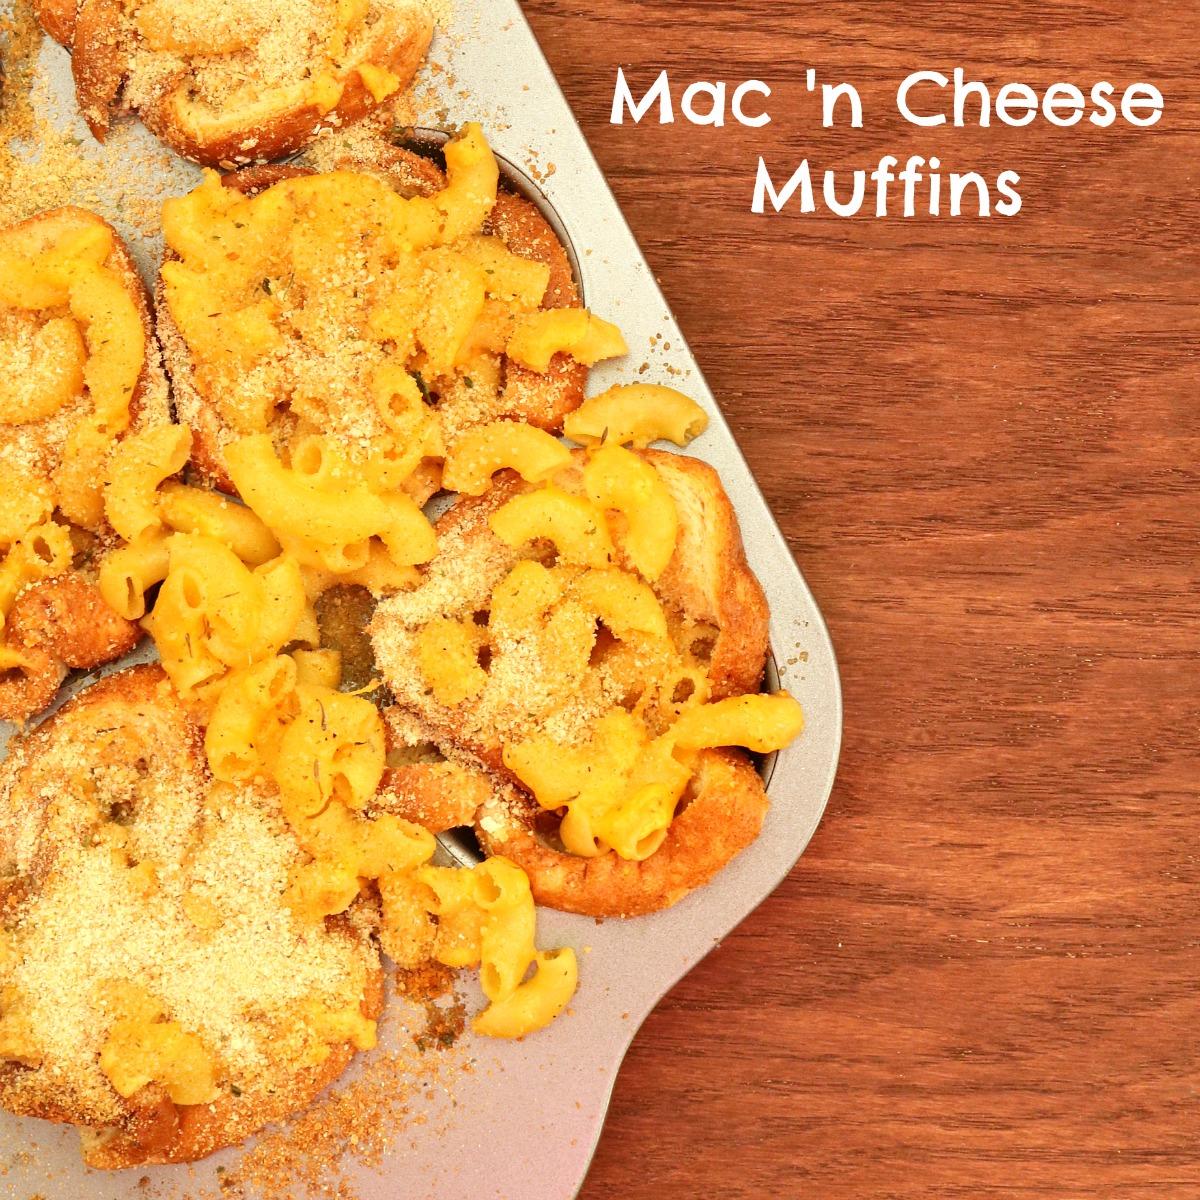 Mac n Cheese Muffins ~ kid friendly recipe from 5DollarDinners.com